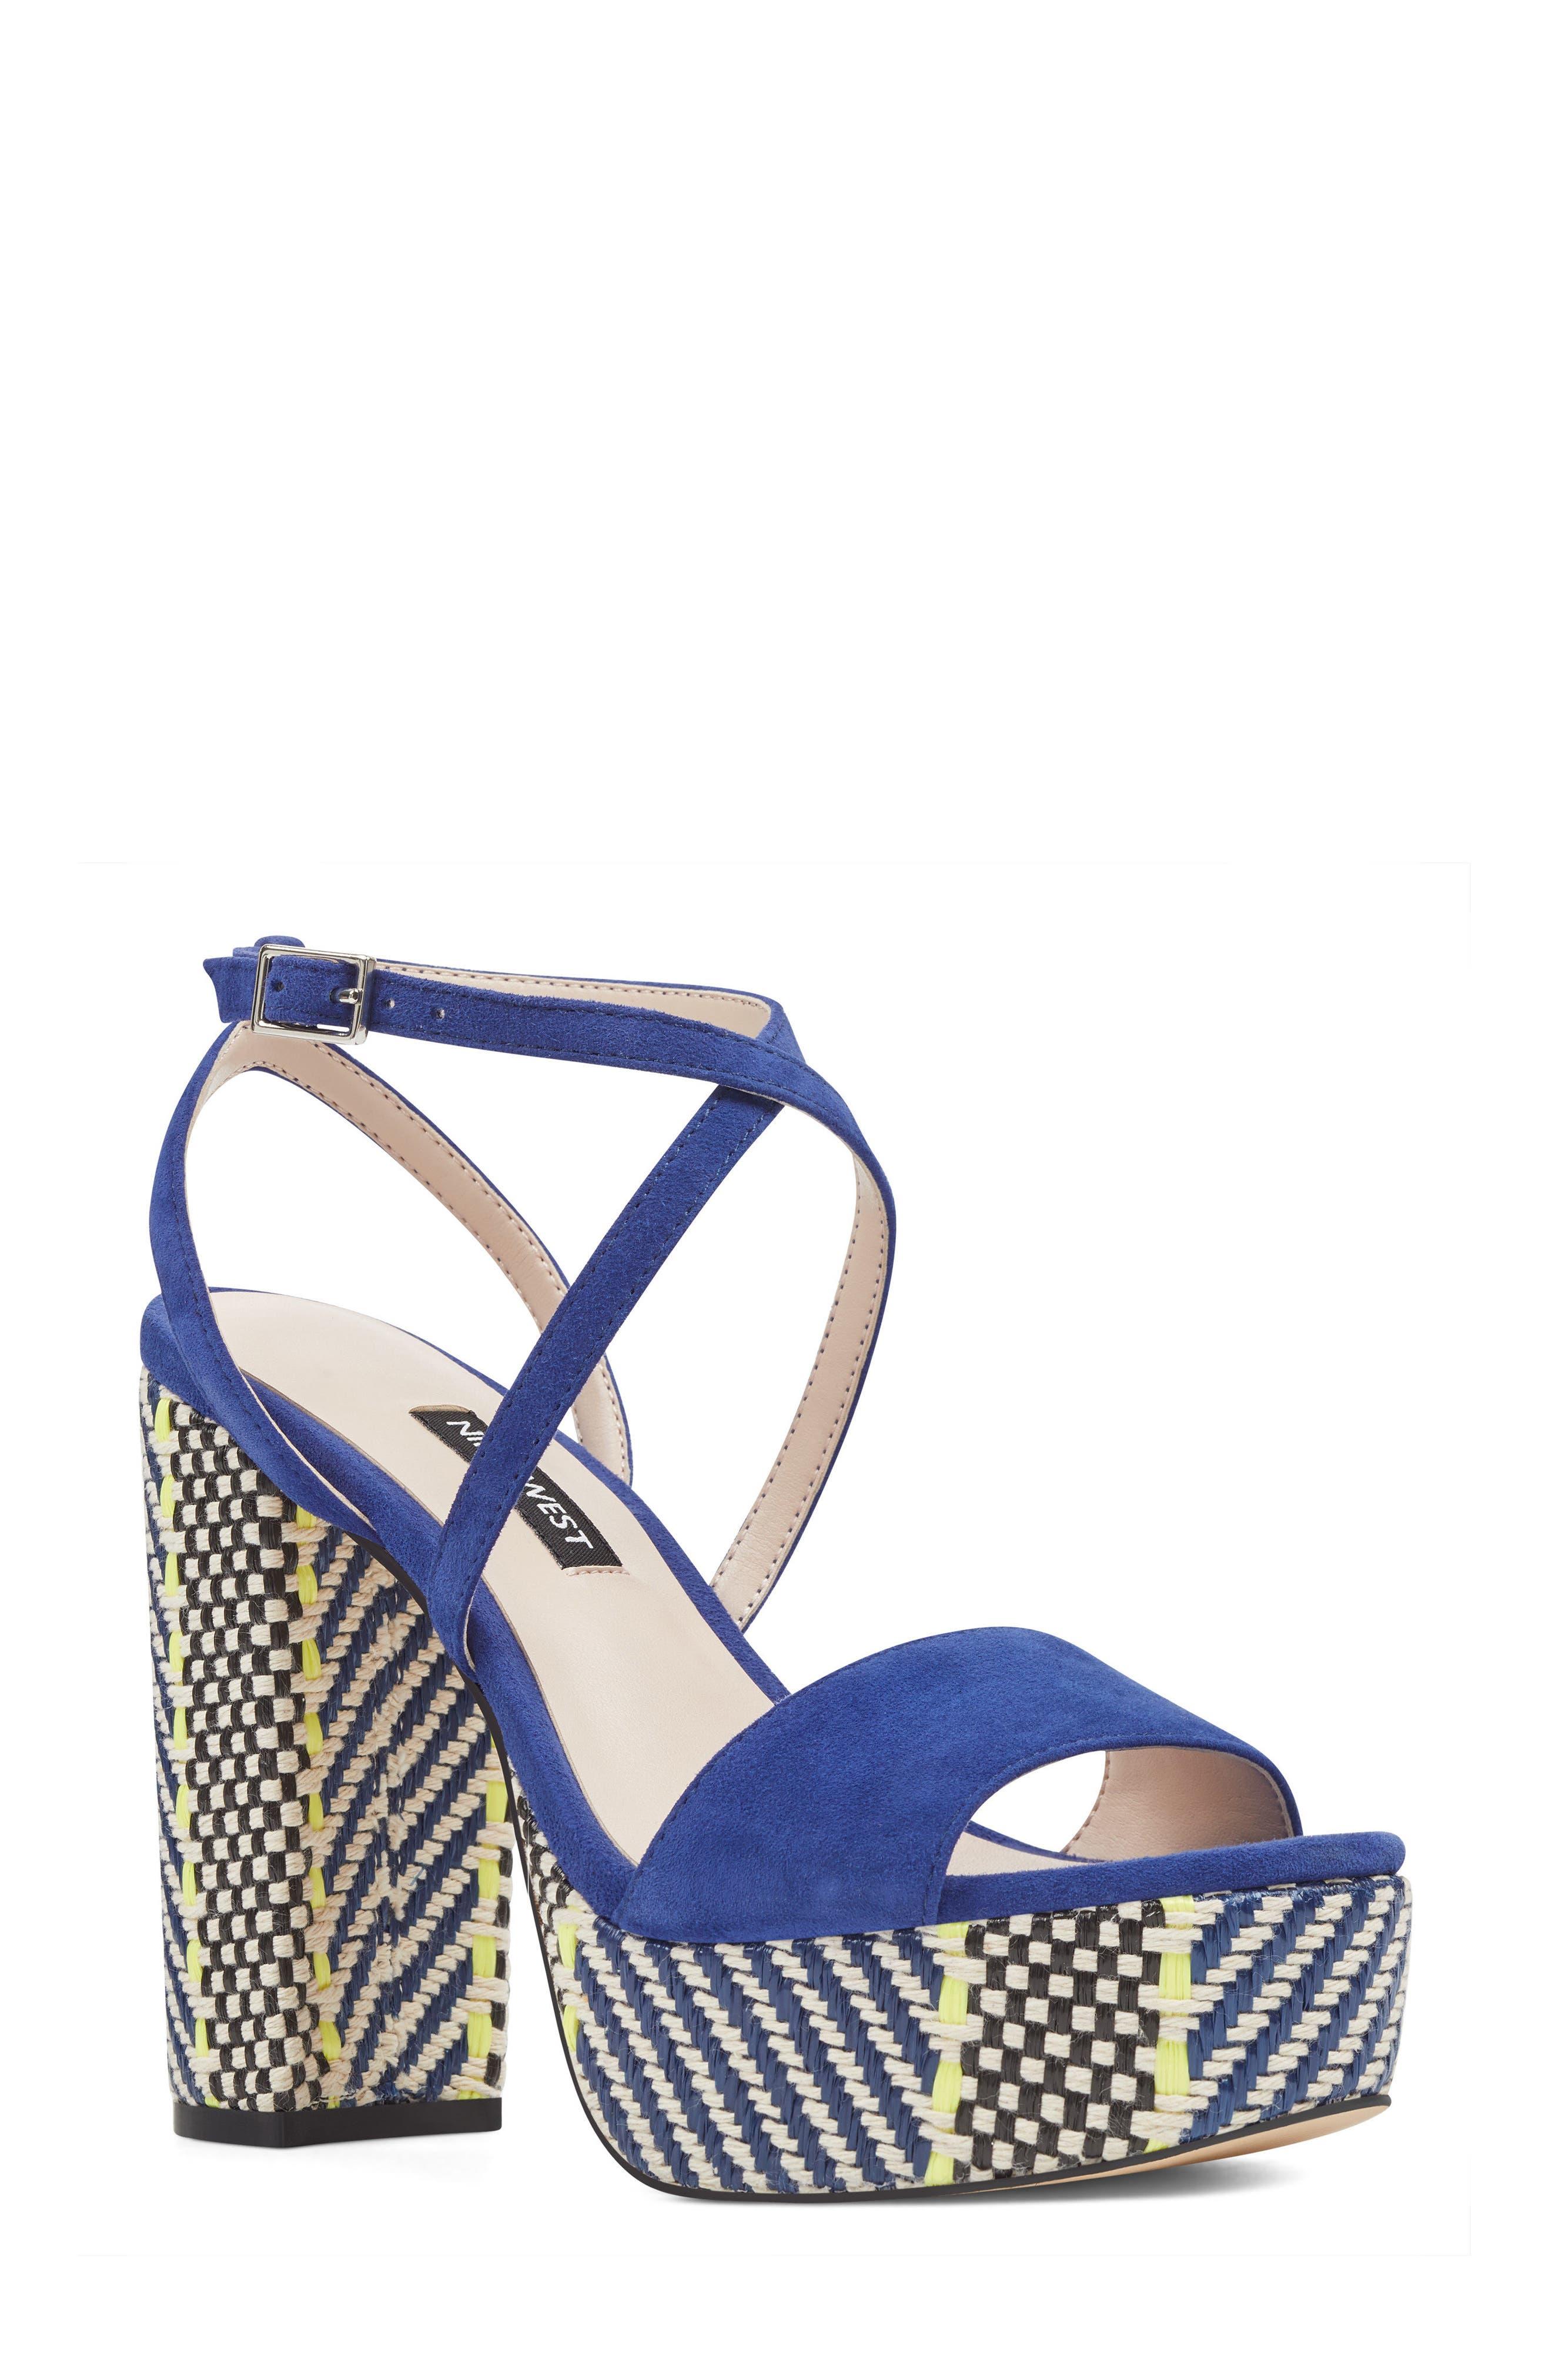 Markando Platform Sandal,                             Main thumbnail 1, color,                             Dark Blue Suede